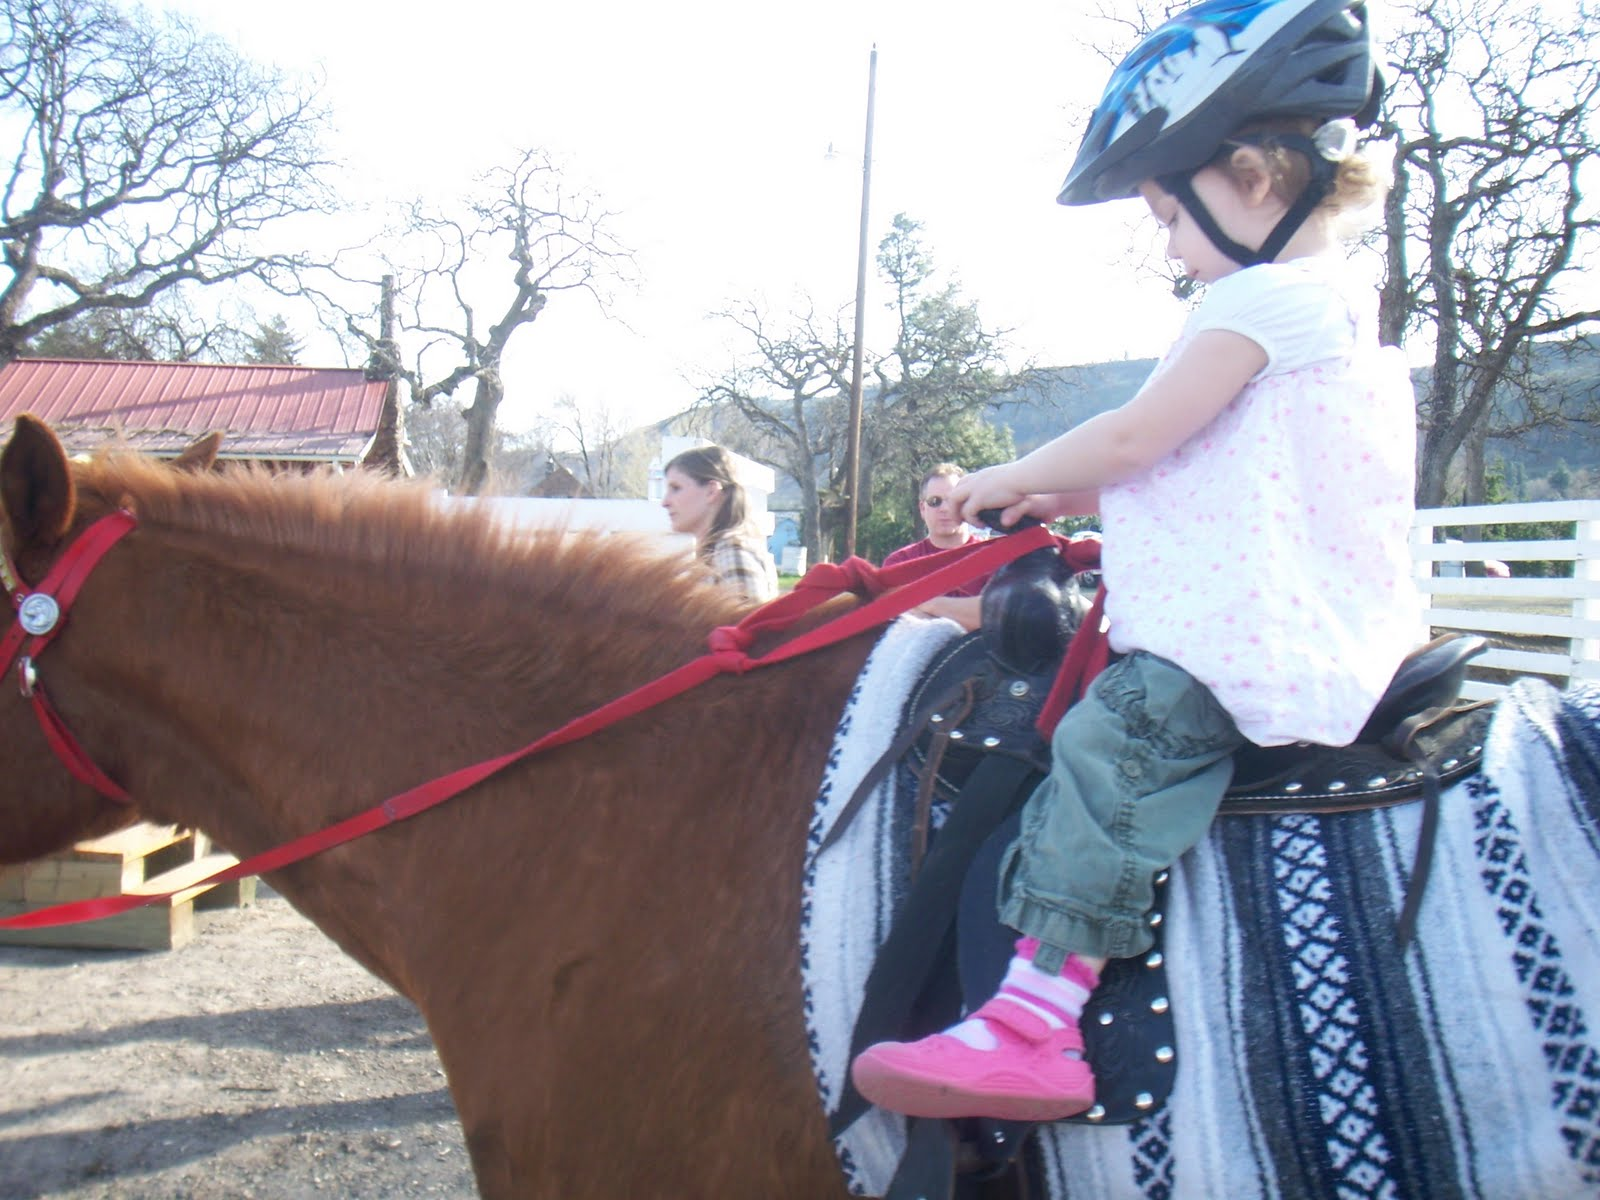 hailey ready to ride ~ no fear ~ she loves animals